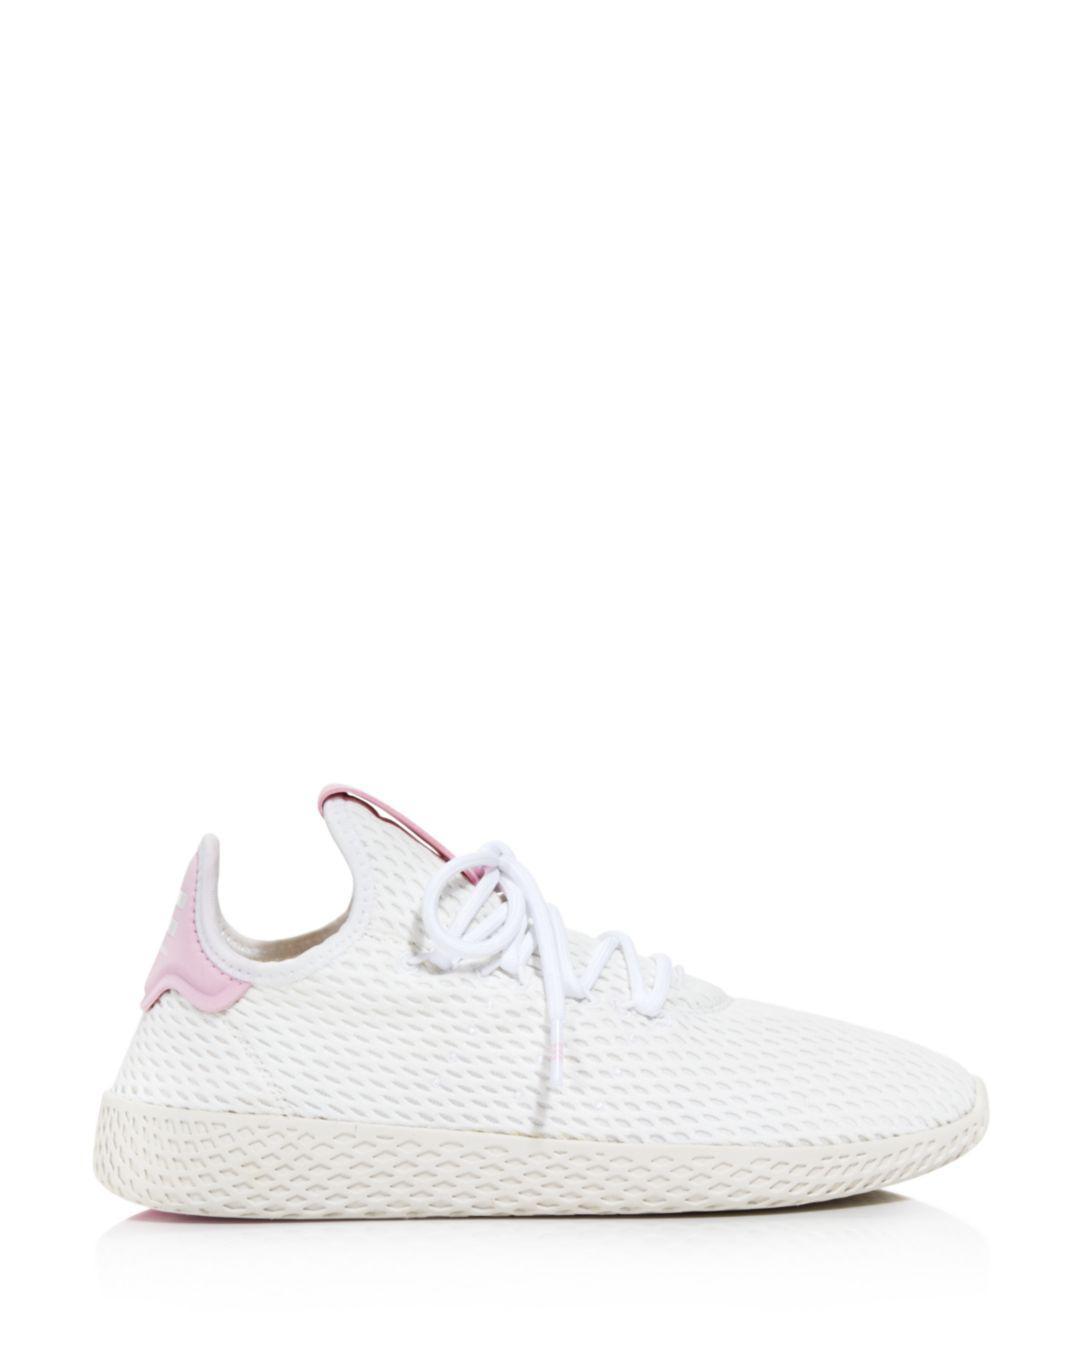 da6eec4b8d8a2 Adidas X Pharrell Williams Women s Tennis Hu Lace Up Sneakers in White -  Lyst